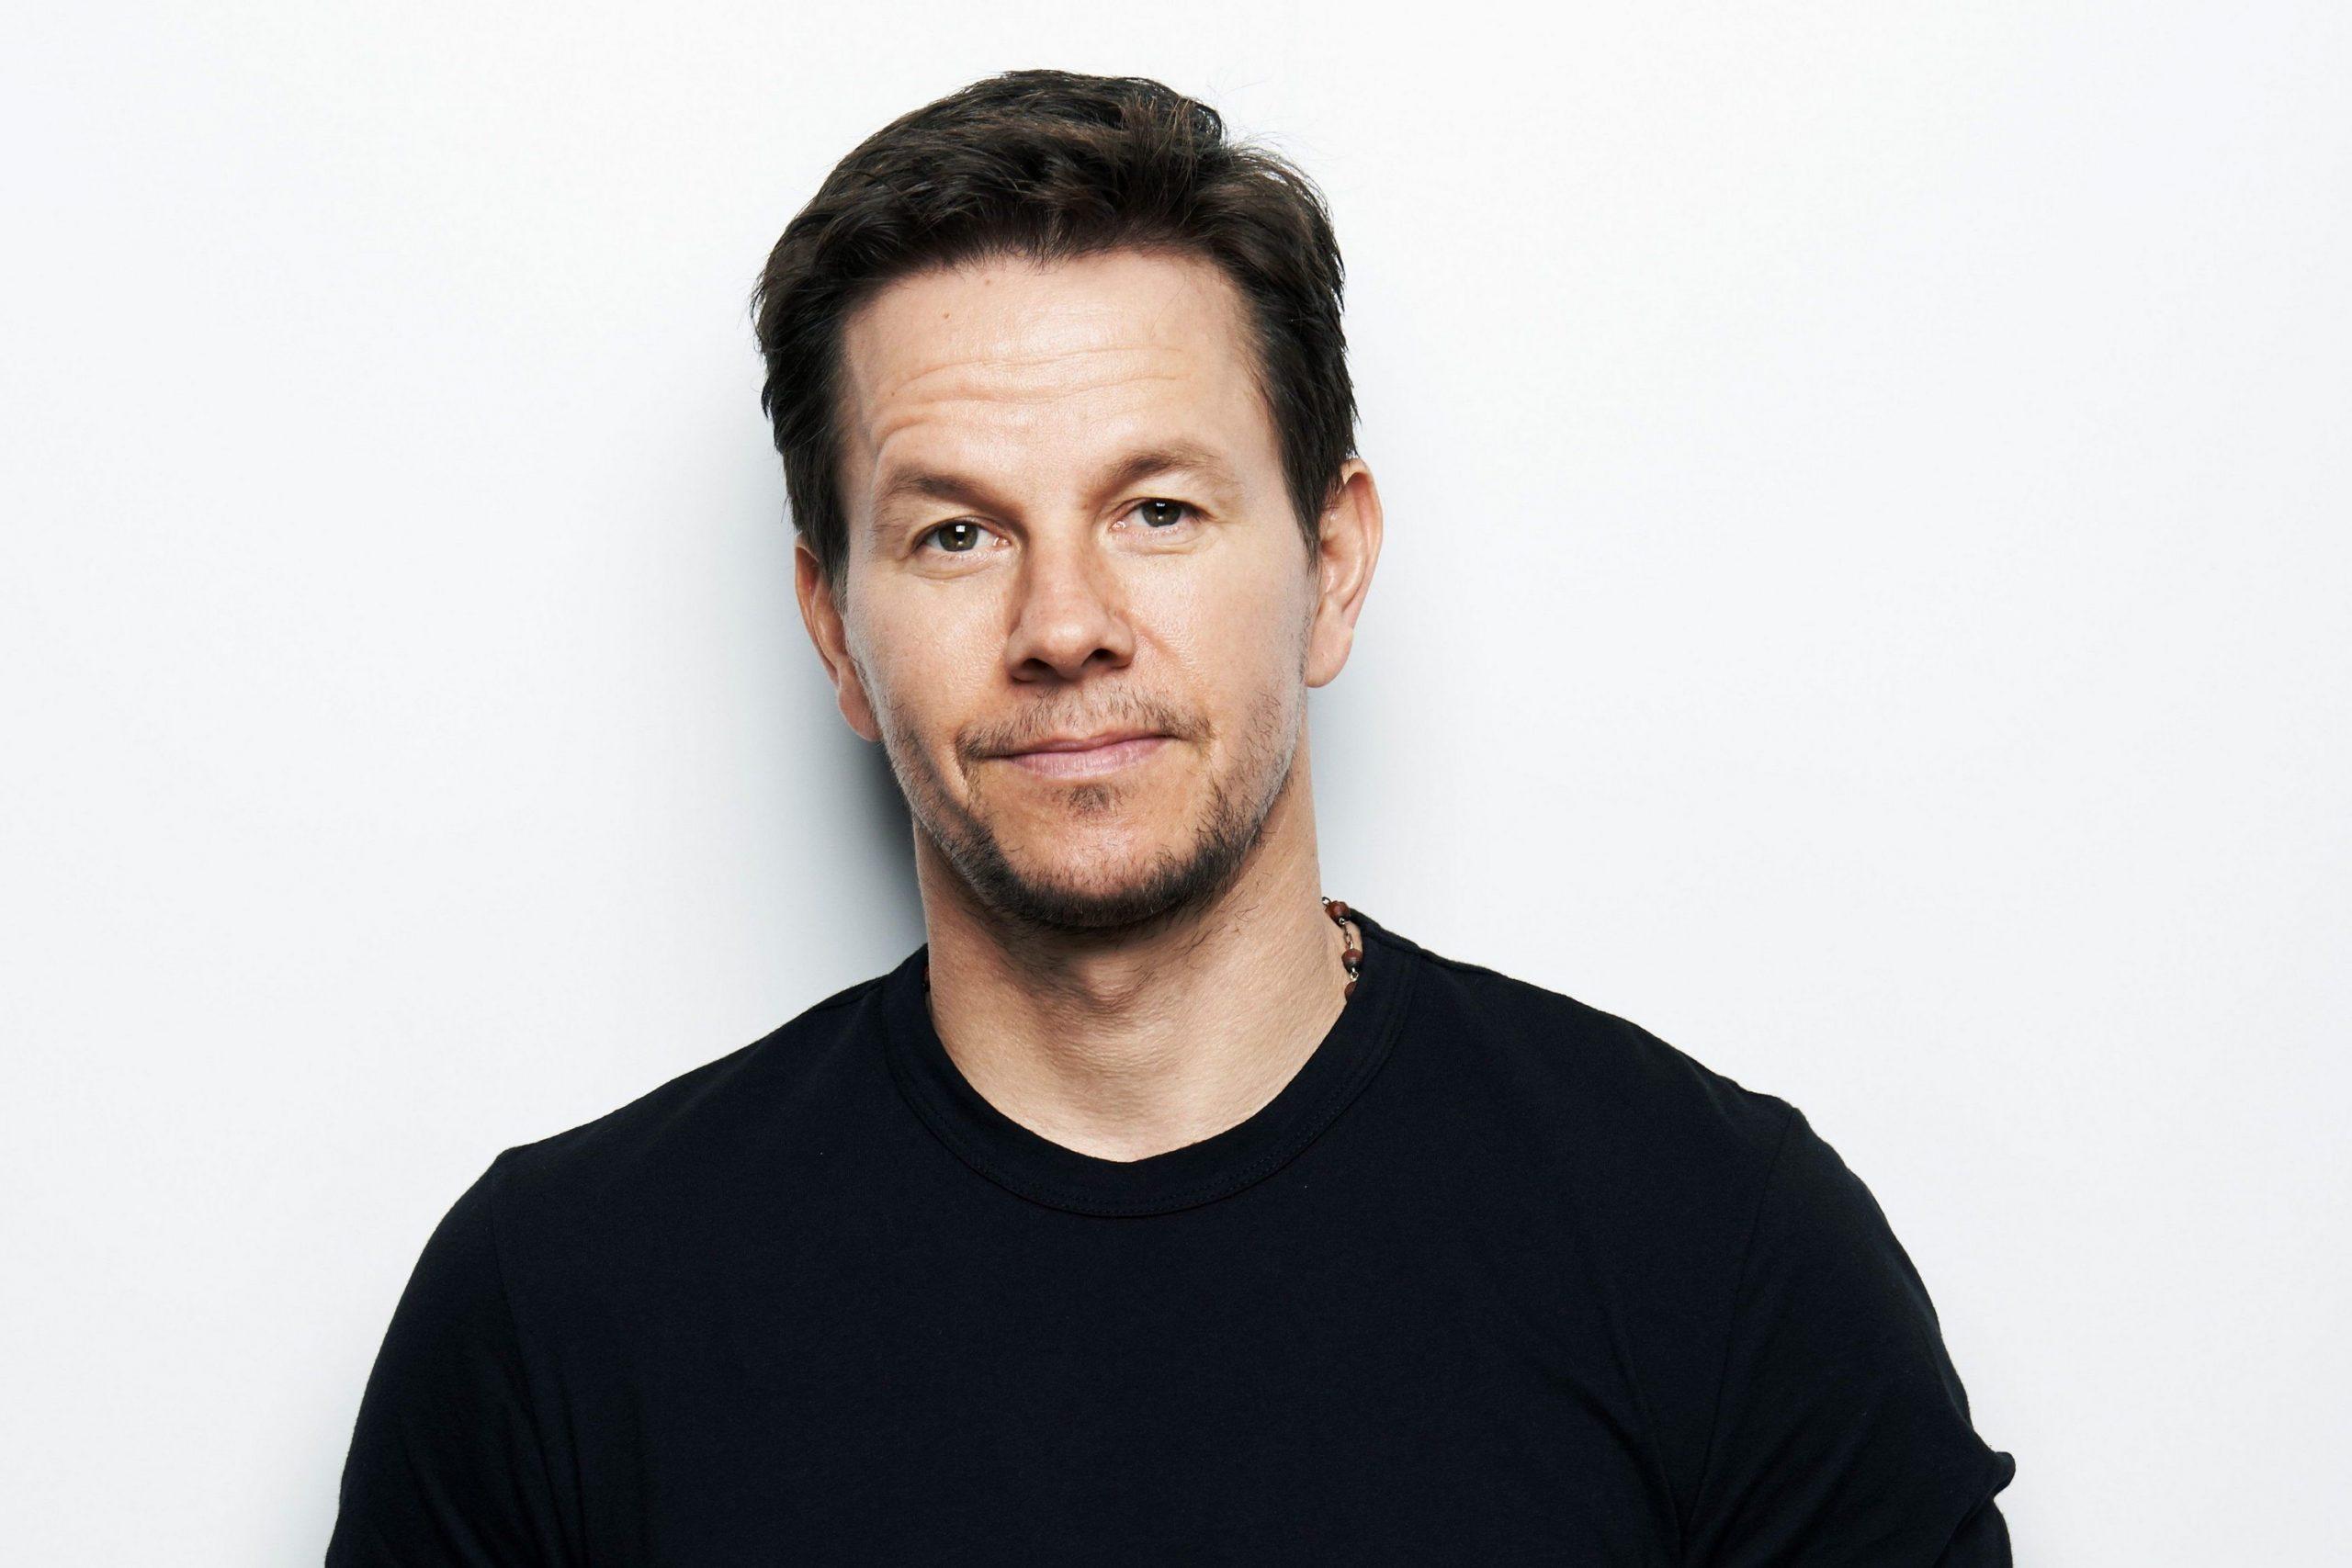 Mark Wahlberg Naked In Movie & Bulge Beach Shots - Men